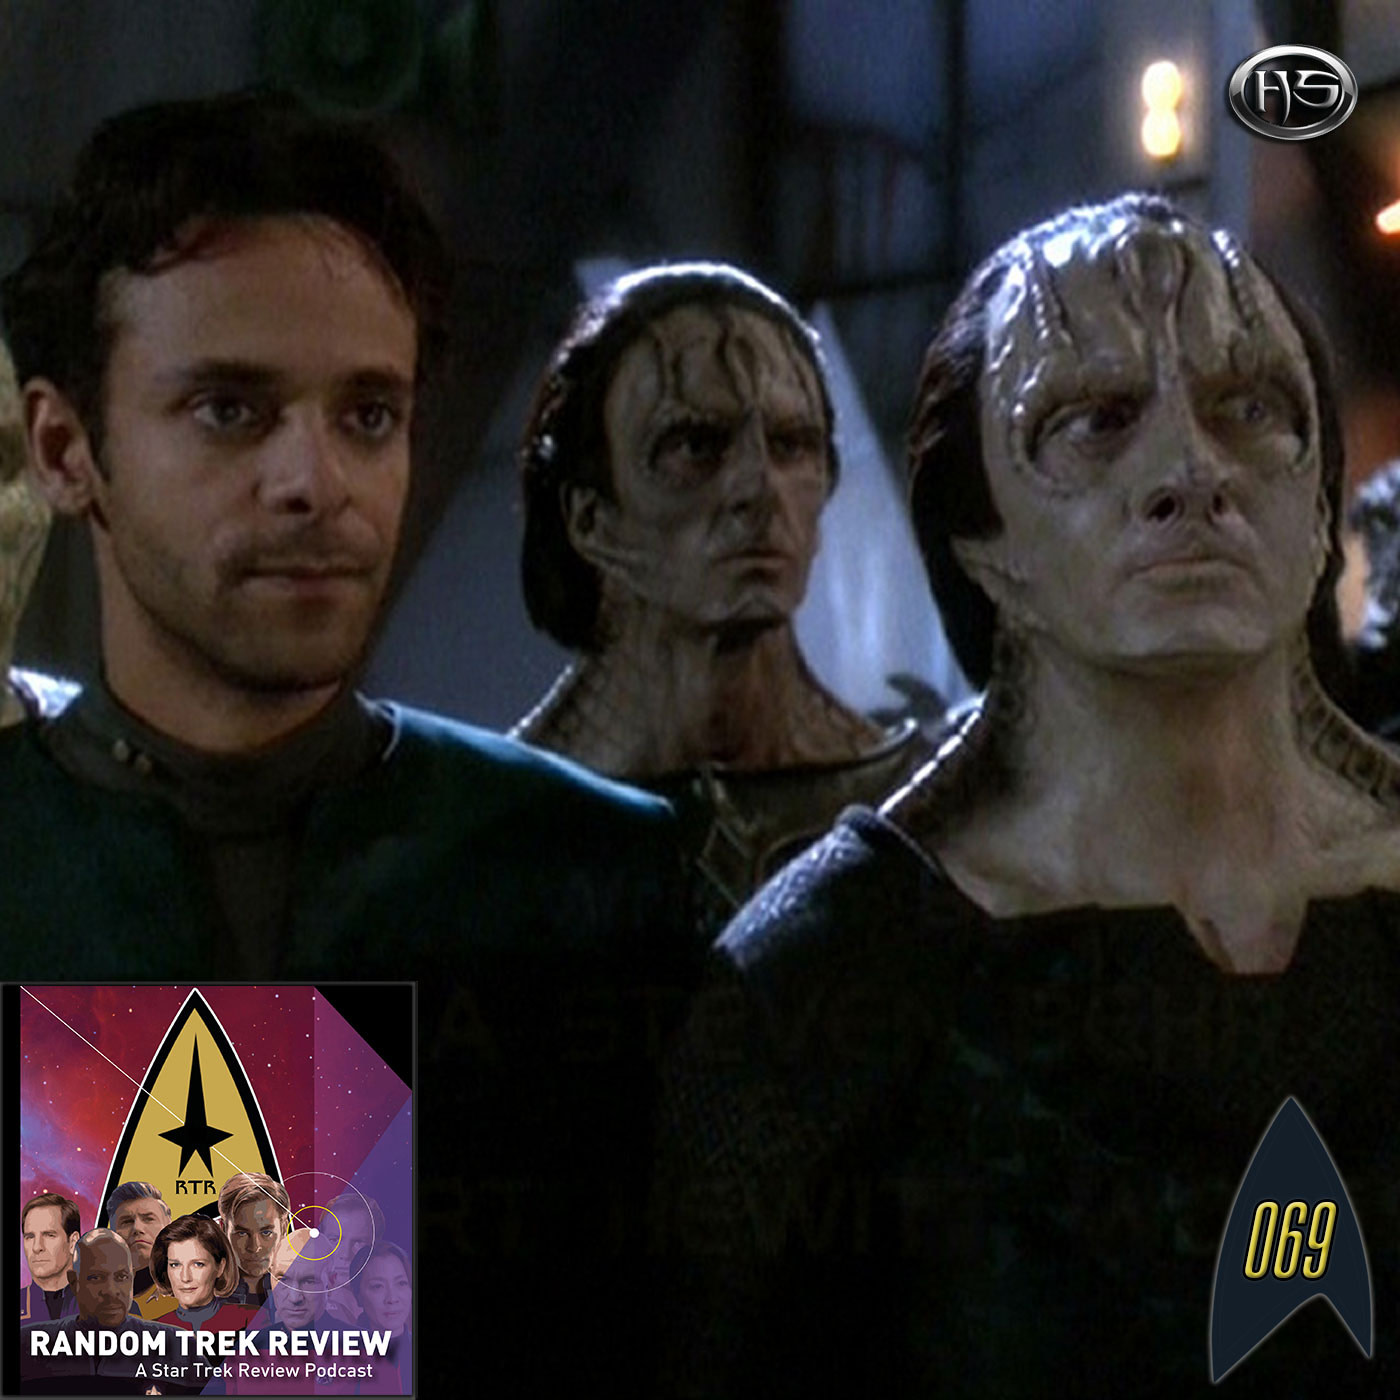 Random Trek Review Episode 69